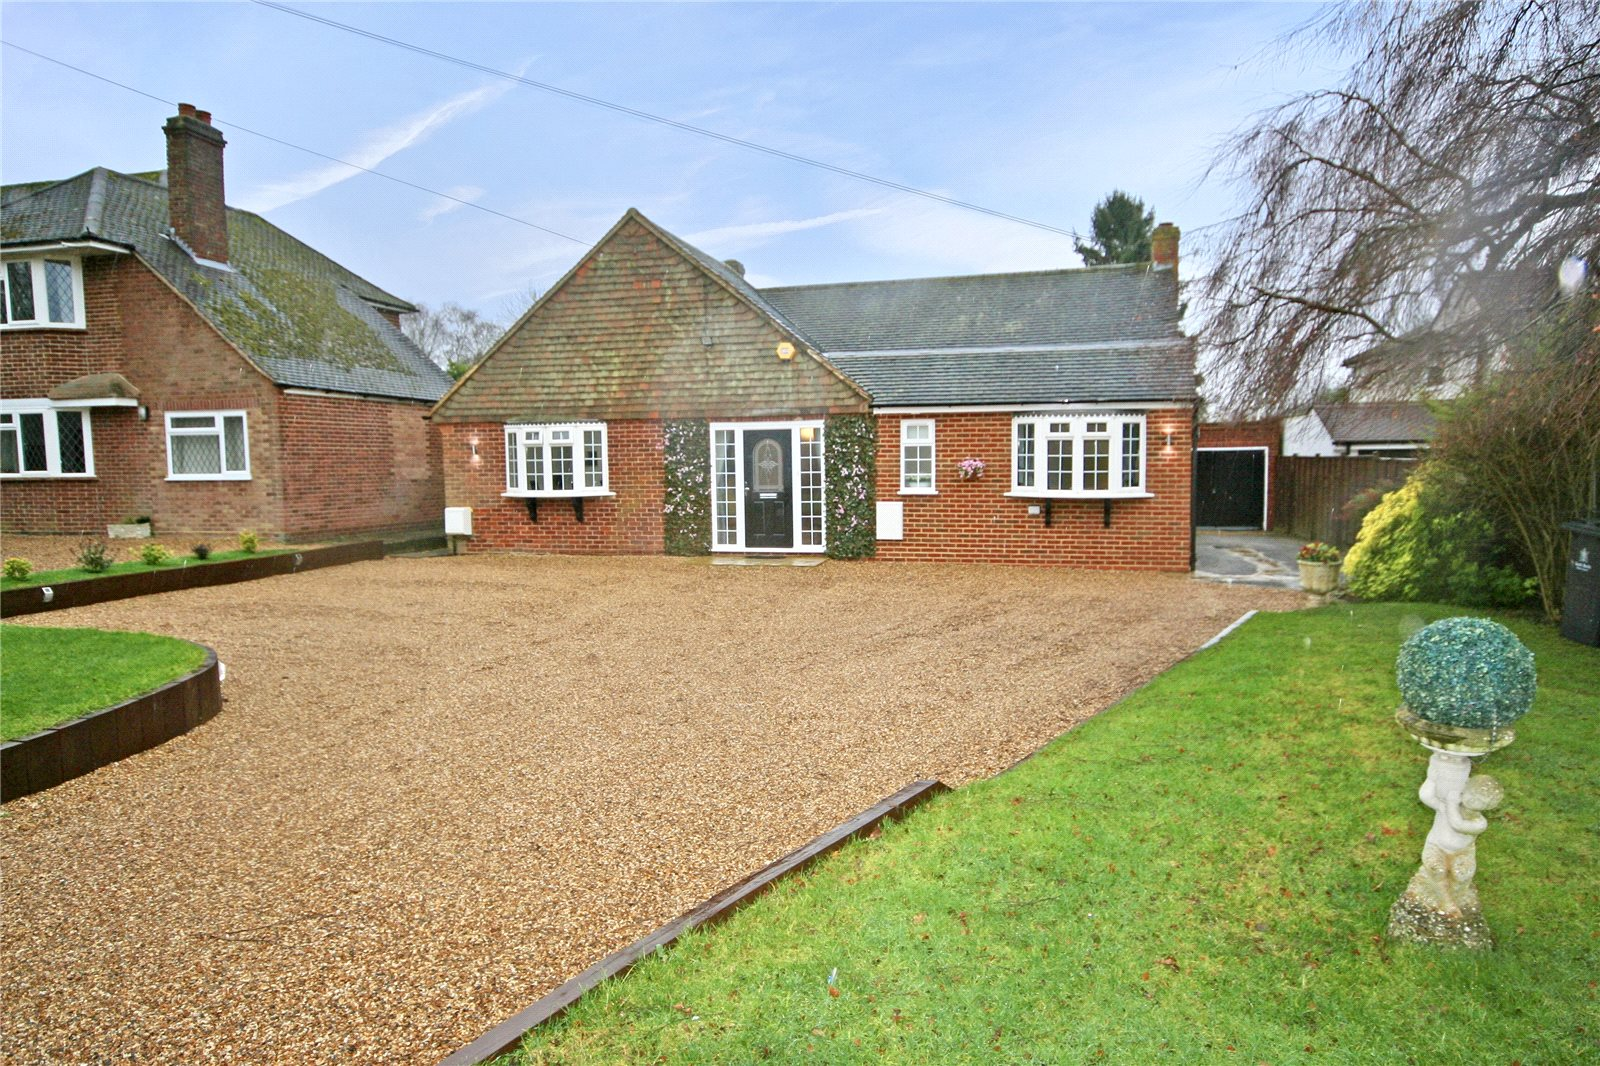 Villa per Vendita alle ore Farthing Green Lane, Stoke Poges, Buckinghamshire, SL2 Stoke Poges, Inghilterra